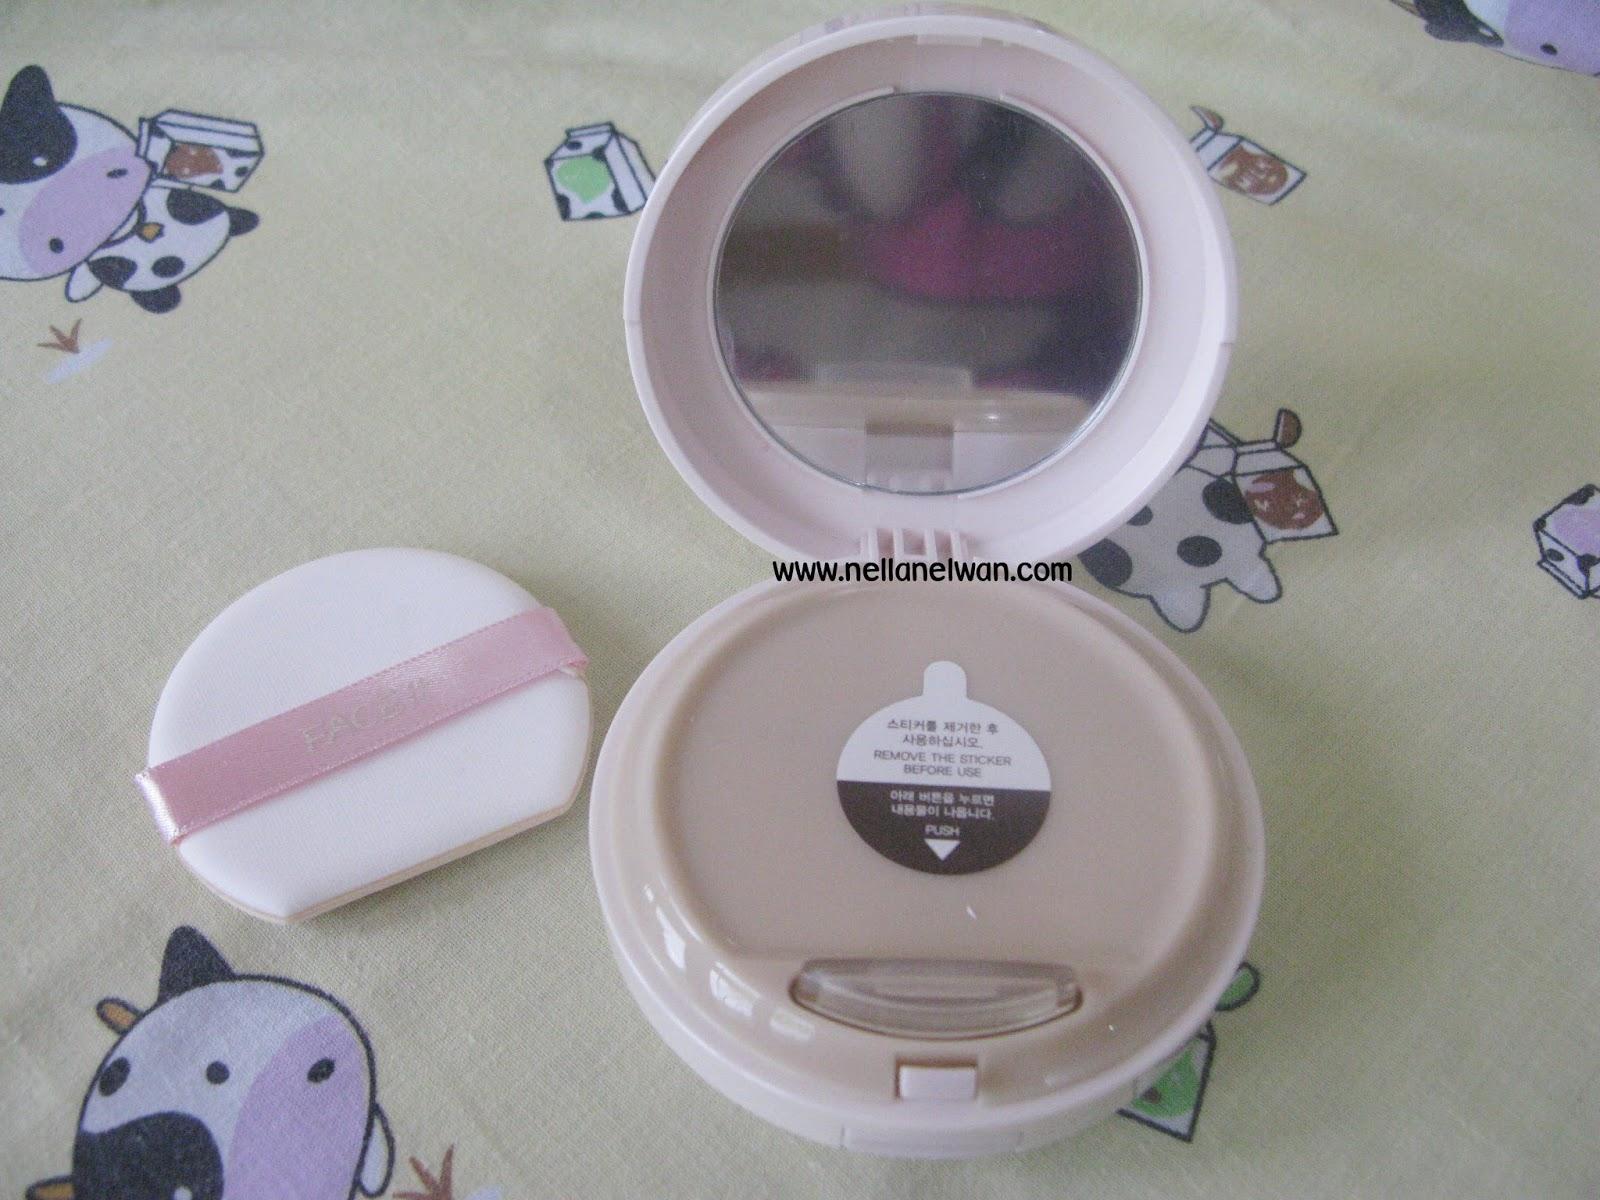 Bên trong hộp sản phẩm Face It Aura CC Cream